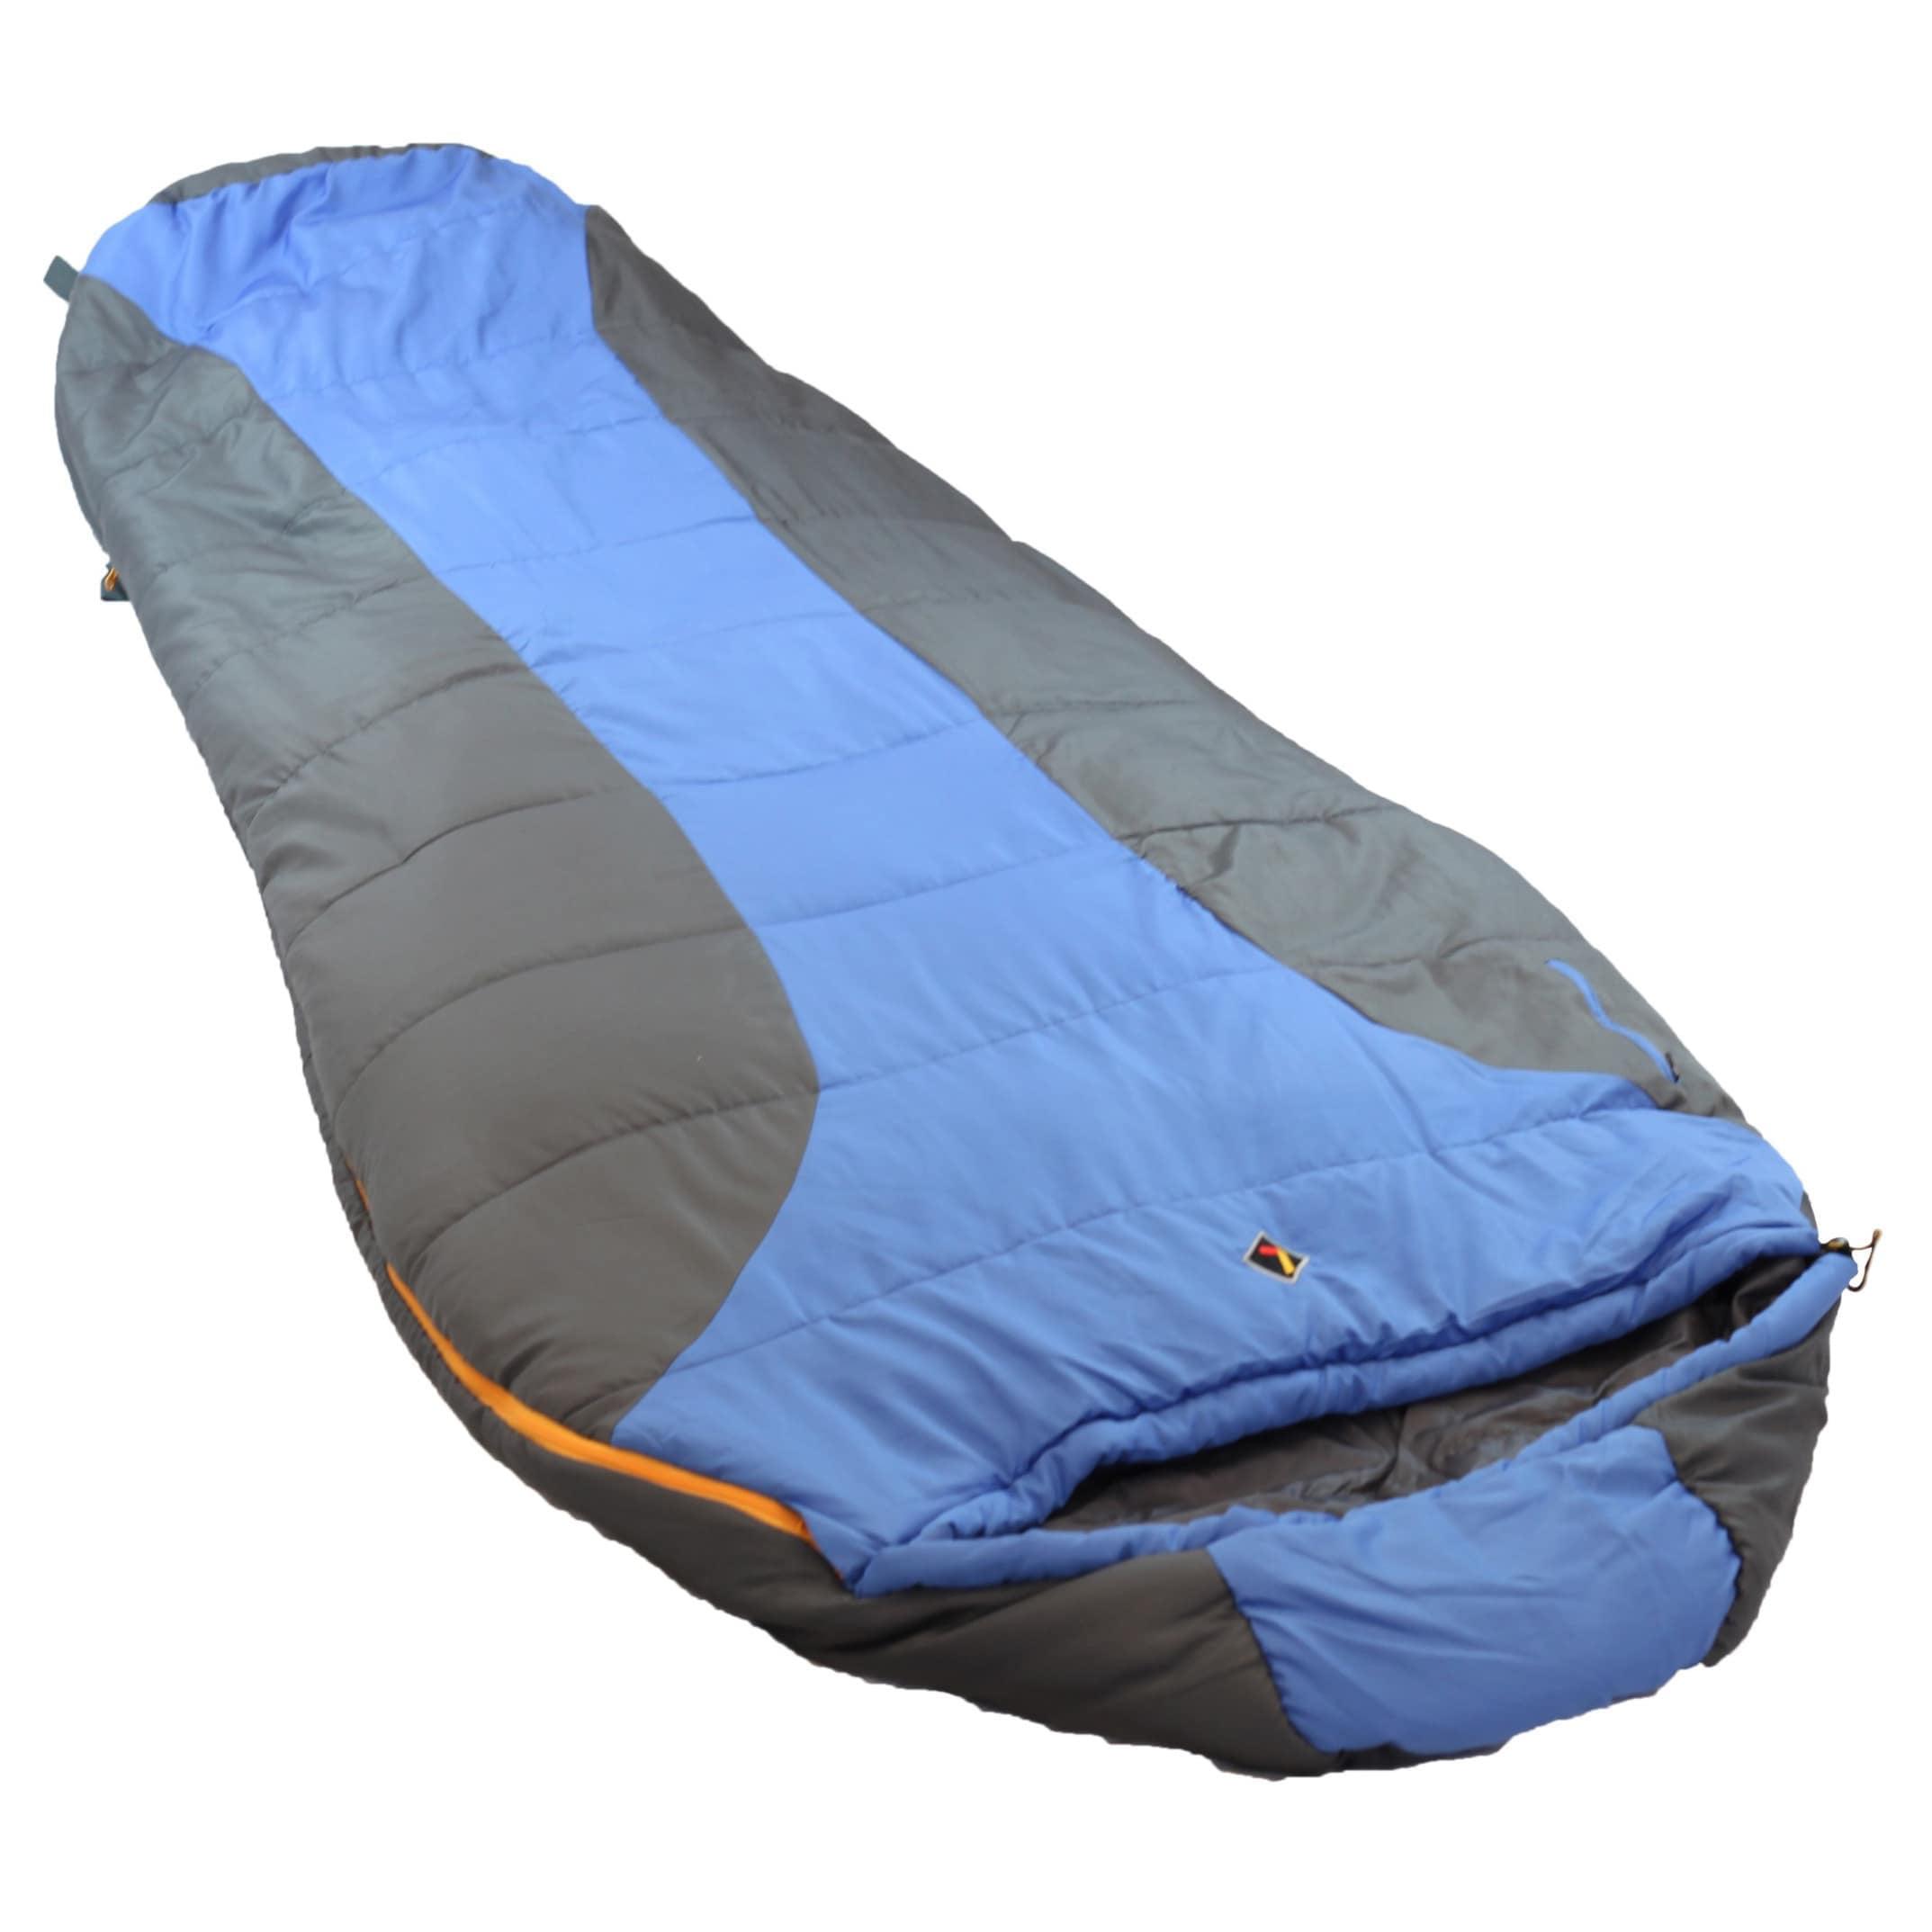 Ledge X-Lite 0-degree Fahrenheit XL Sleeping Bag by Overstock